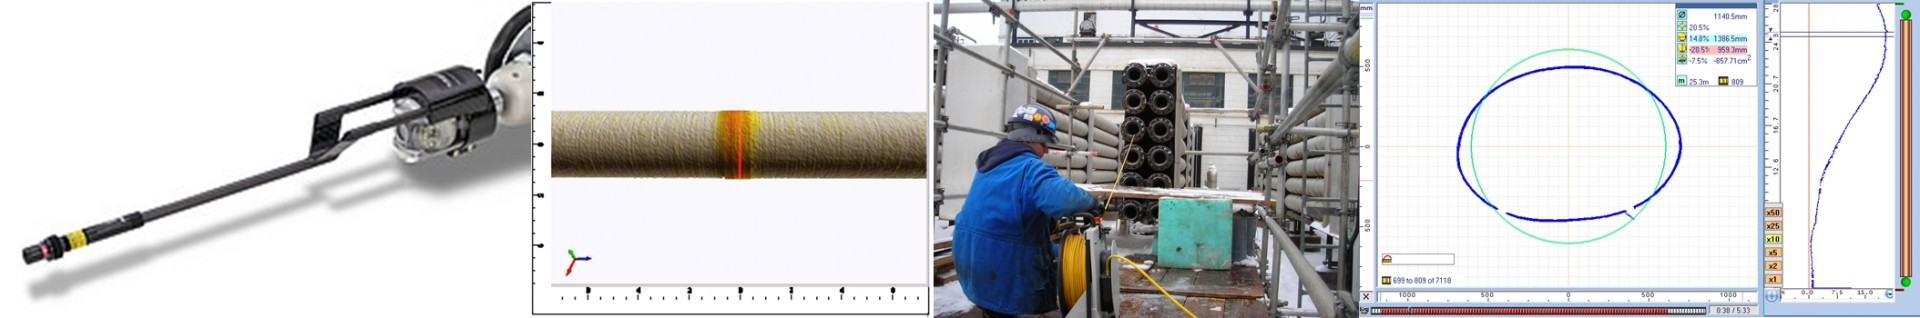 Laser Pipe Profiling Maverick Inspection